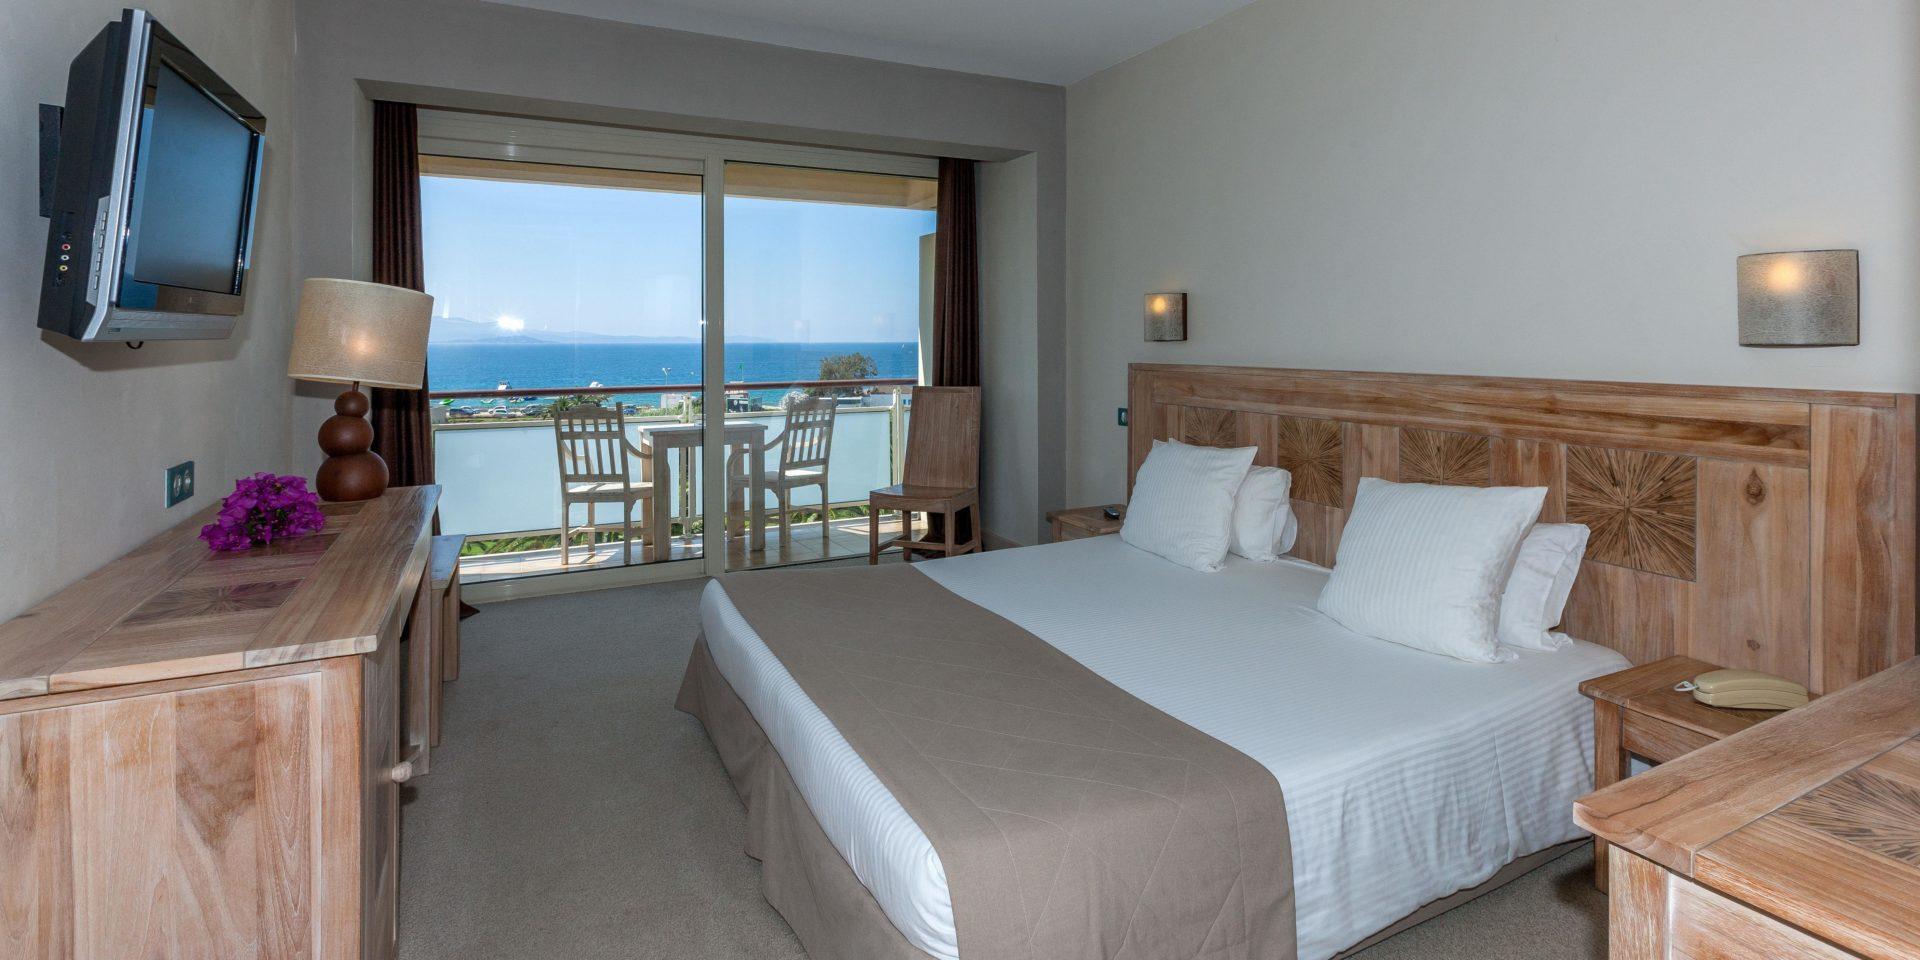 Hotel Campo dell'Oro Ajaccio Corsica Frankrijk tweepersoonskamer mer balkon terras zeezicht